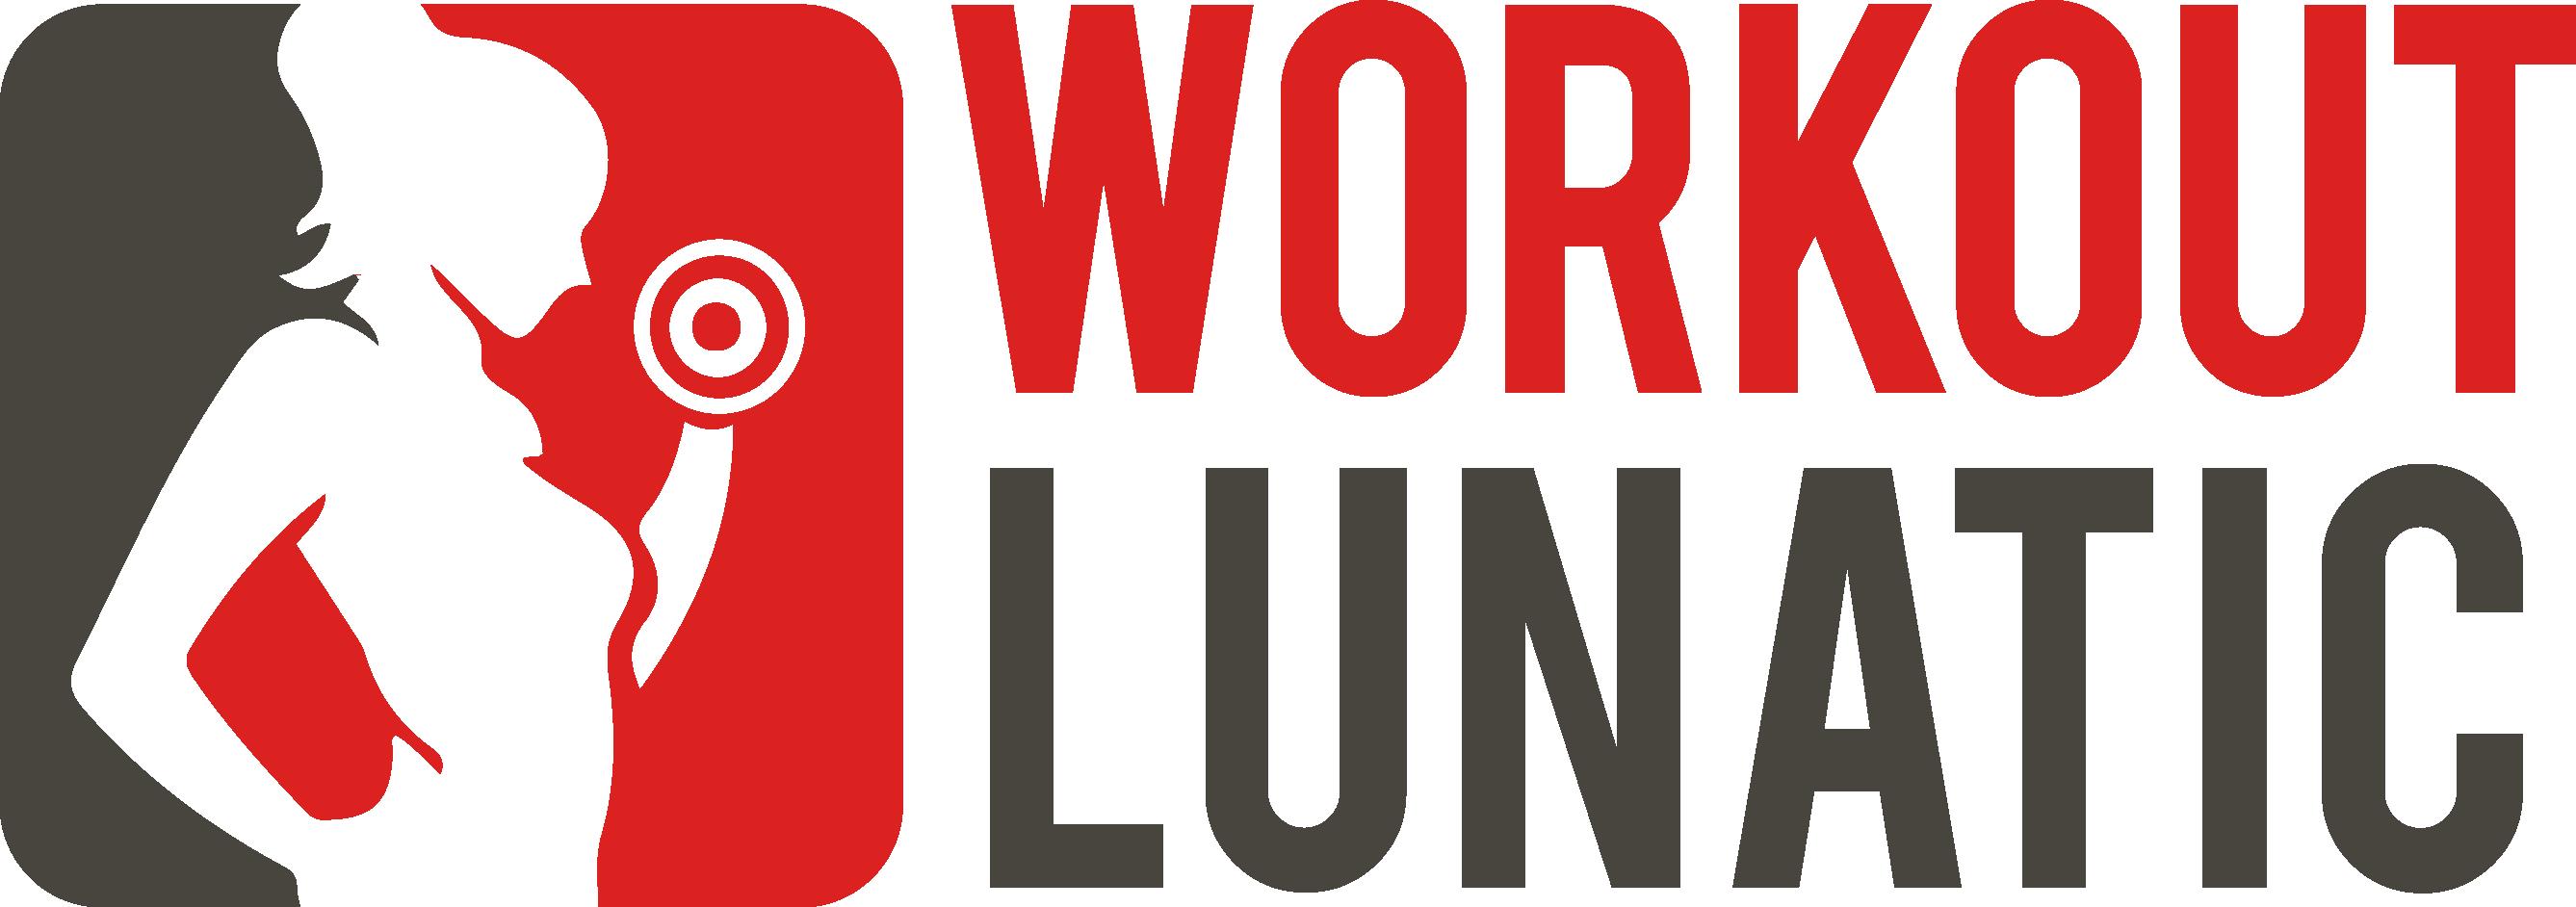 Workout Lunatic Logo